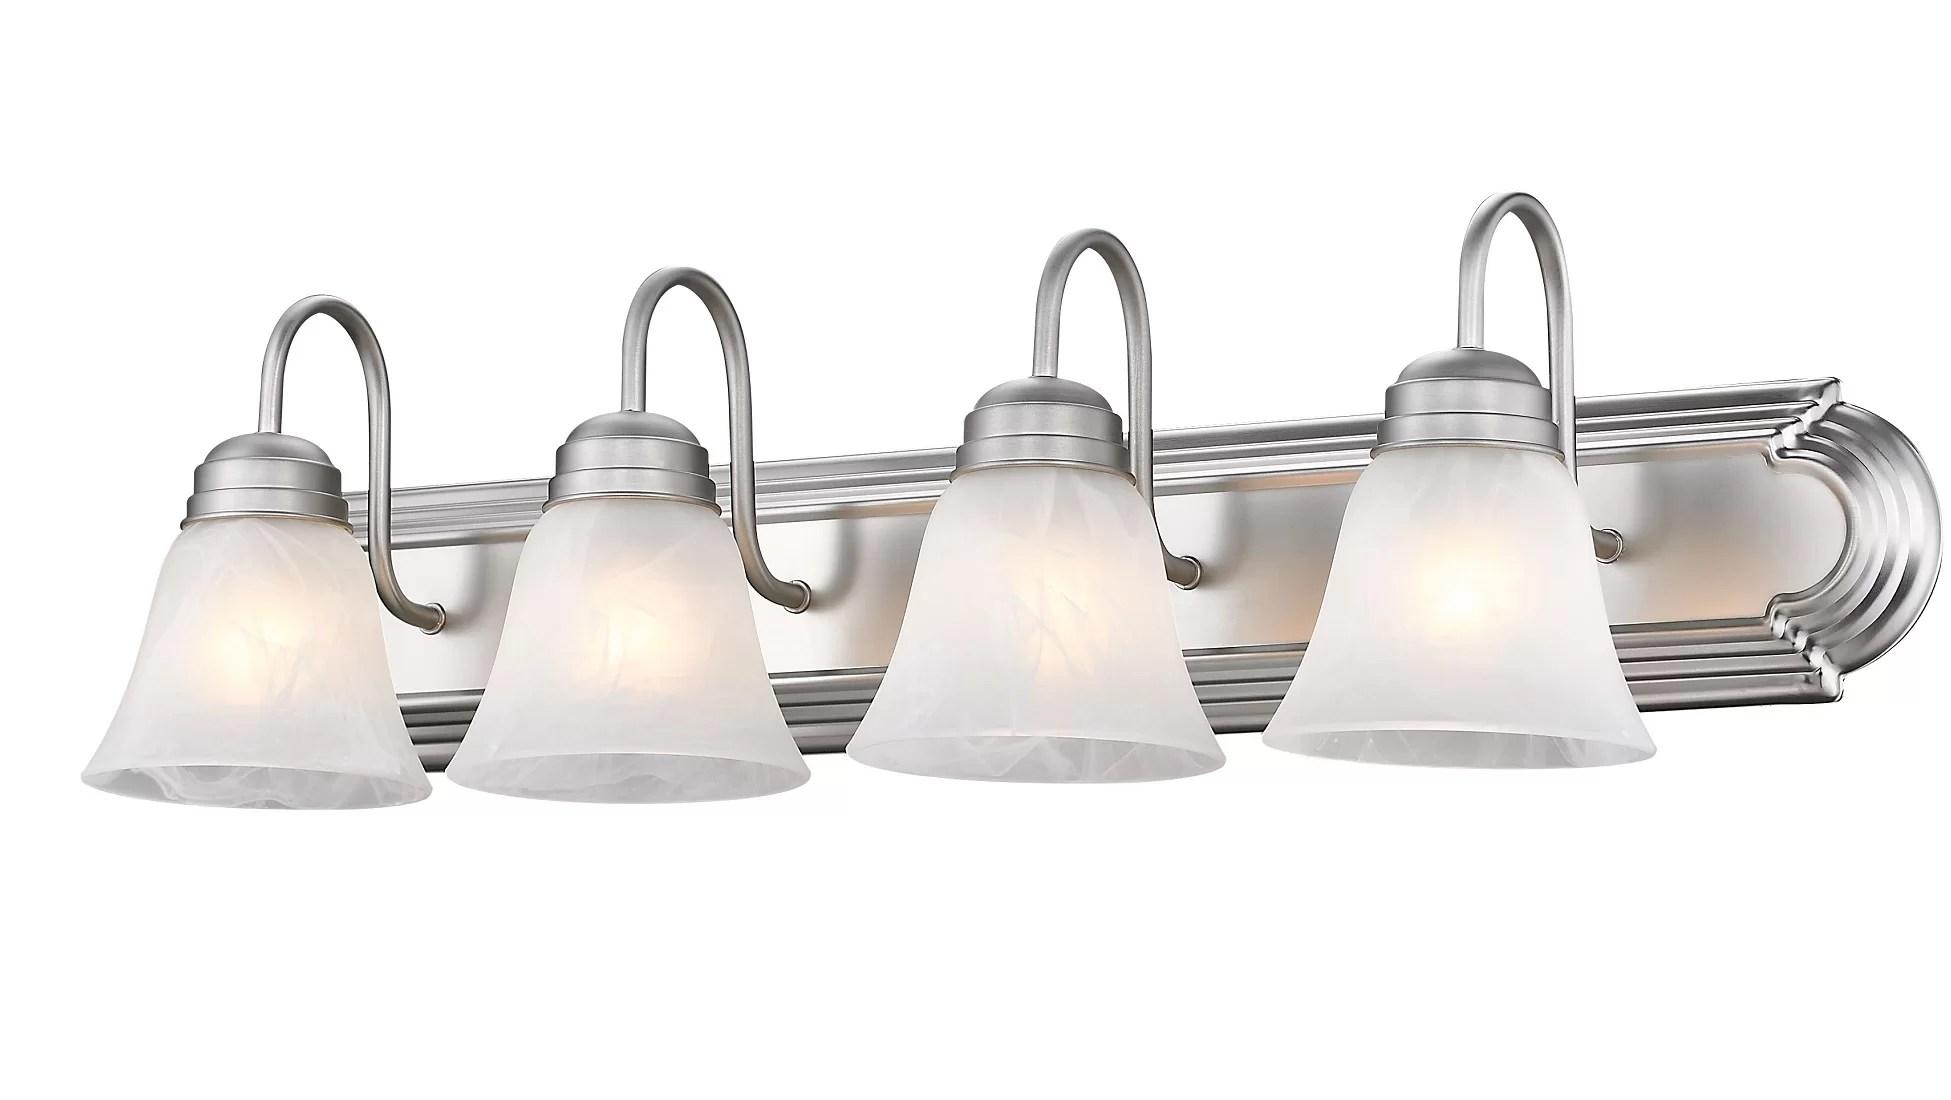 Winston Porter Carsdale Bathroom 4 Light Satin Nickel Vanity Light Reviews Wayfair